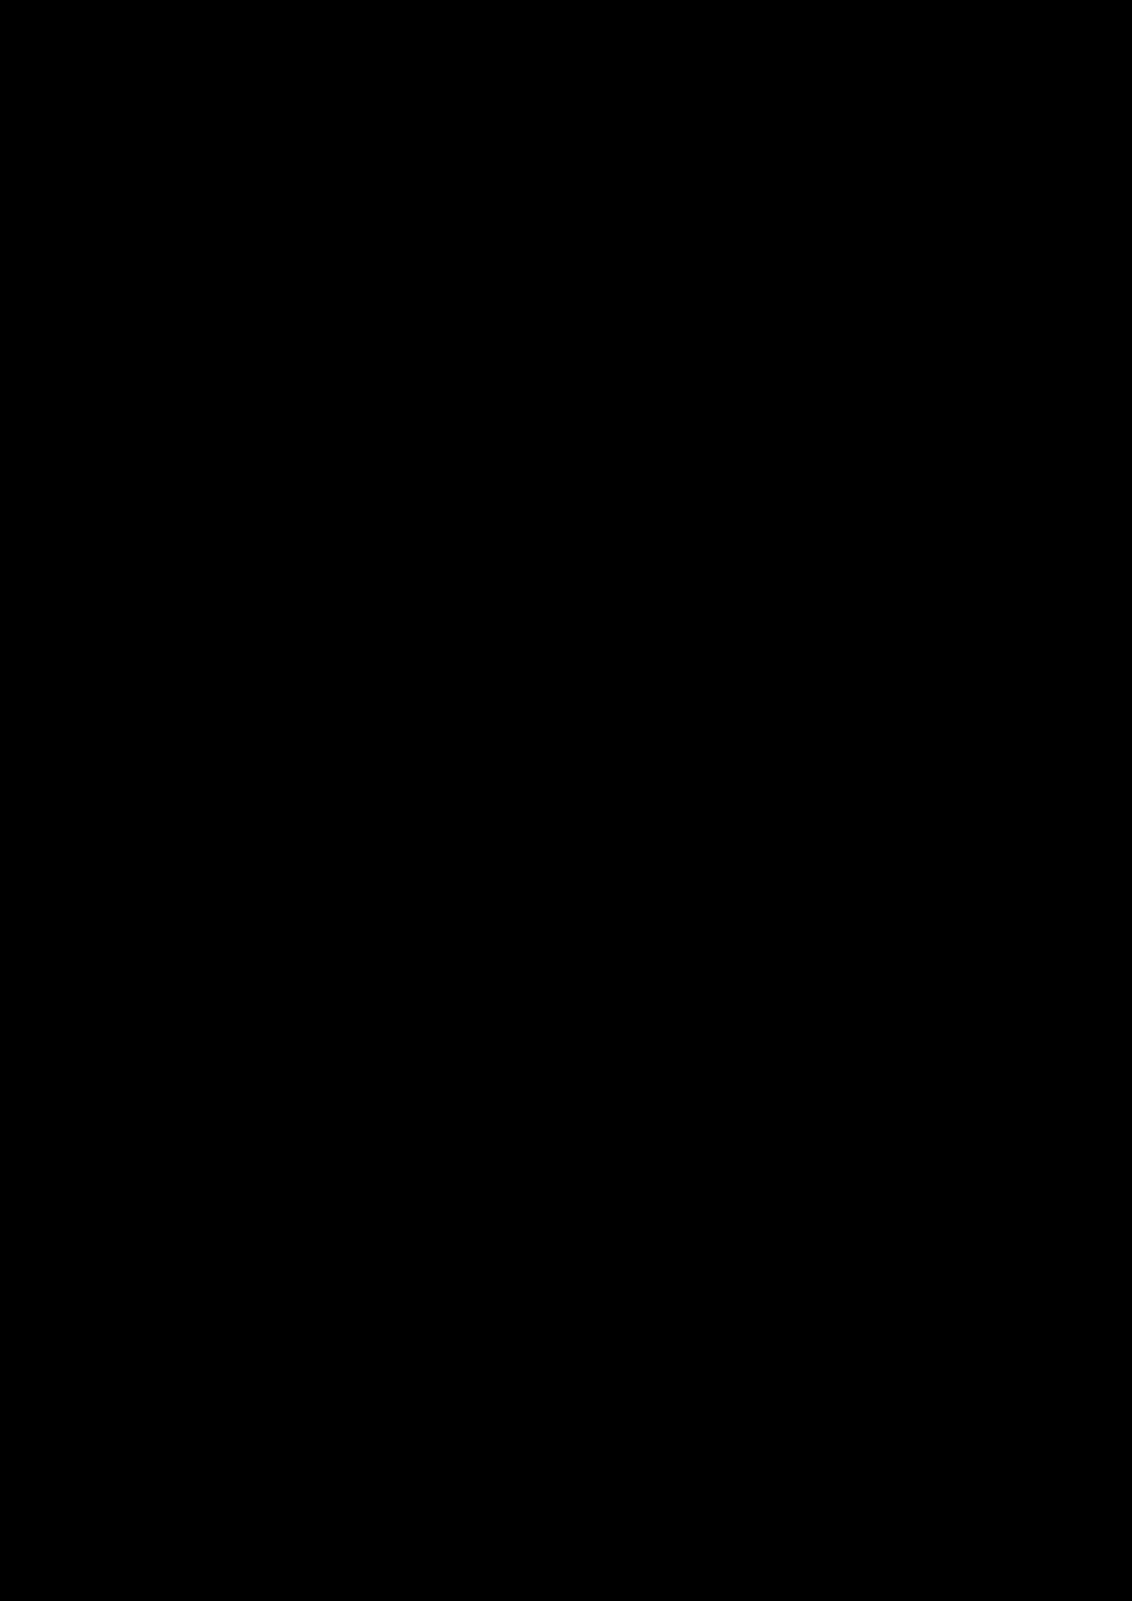 Ispoved Pervogo Boga slide, Image 13